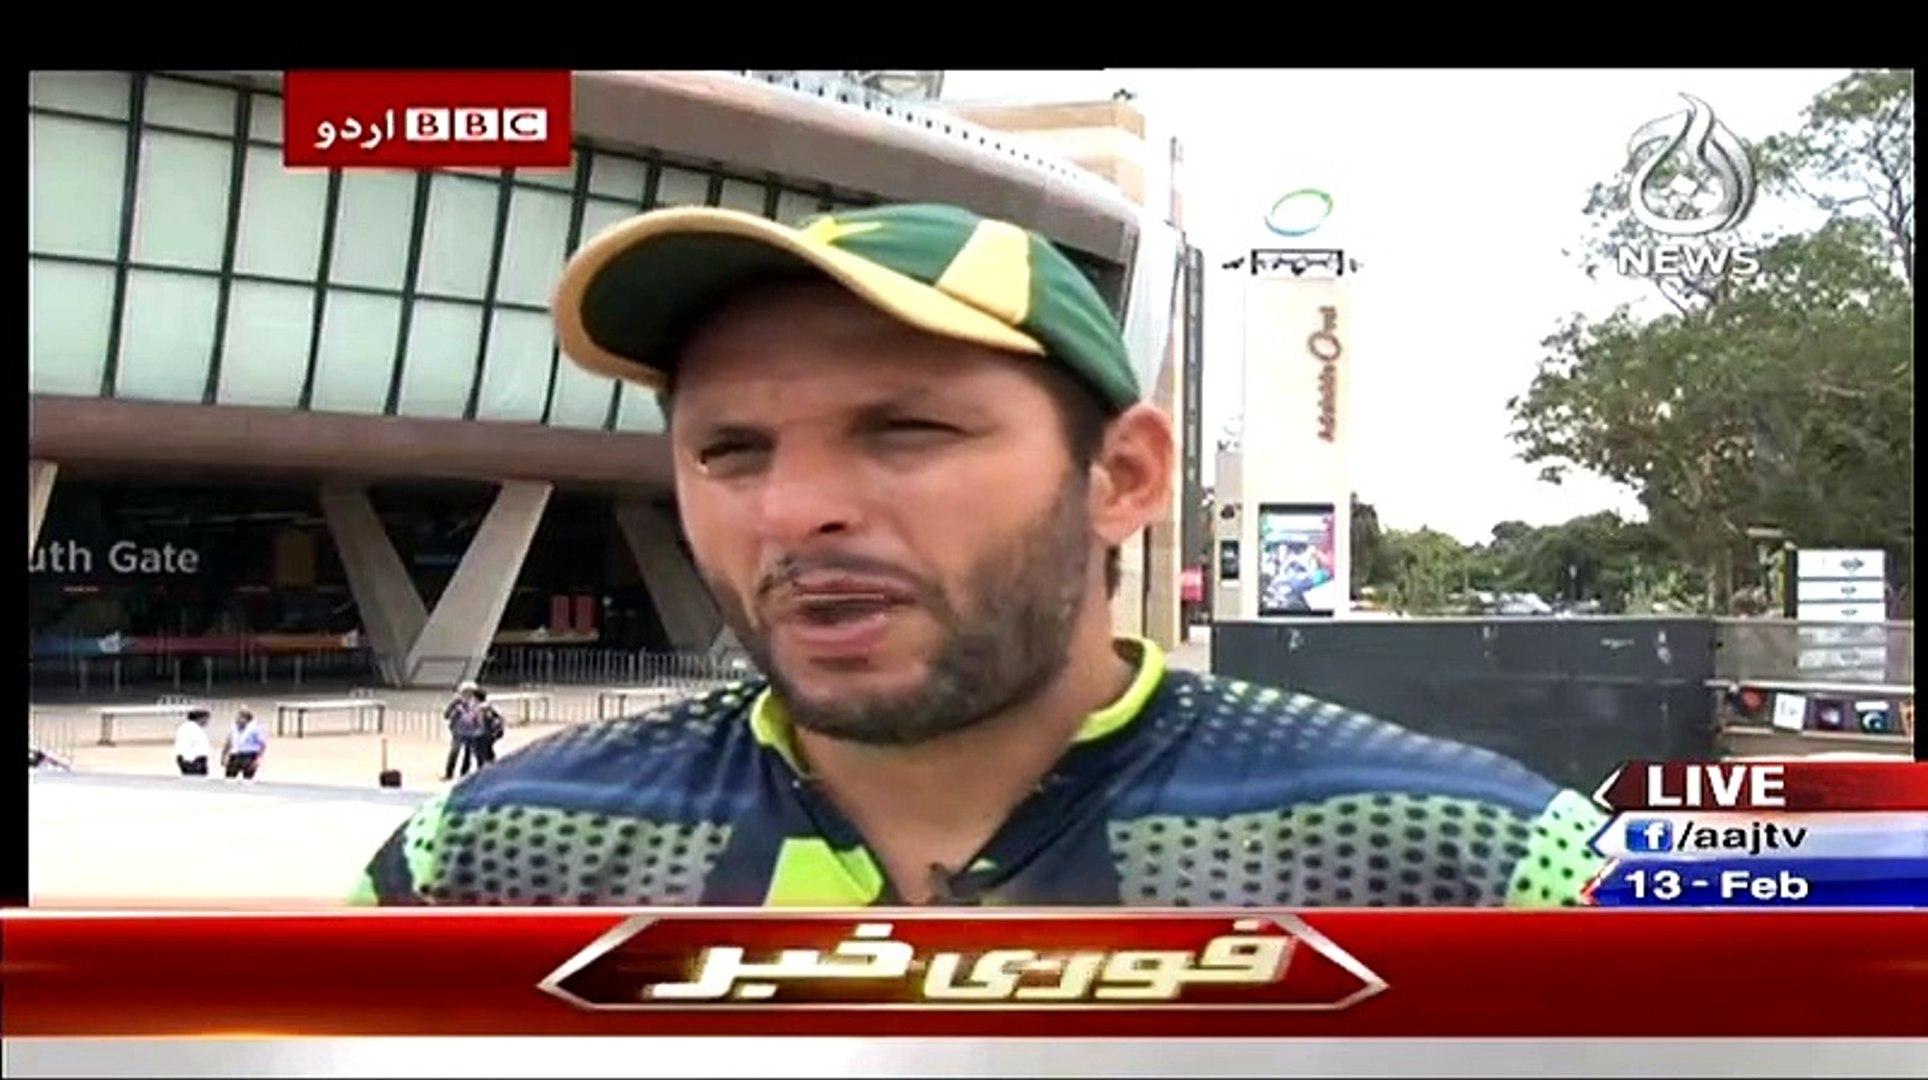 BBC Urdu Sairbeen On Aaj News ~ 13th February 2015 - Live Pak News